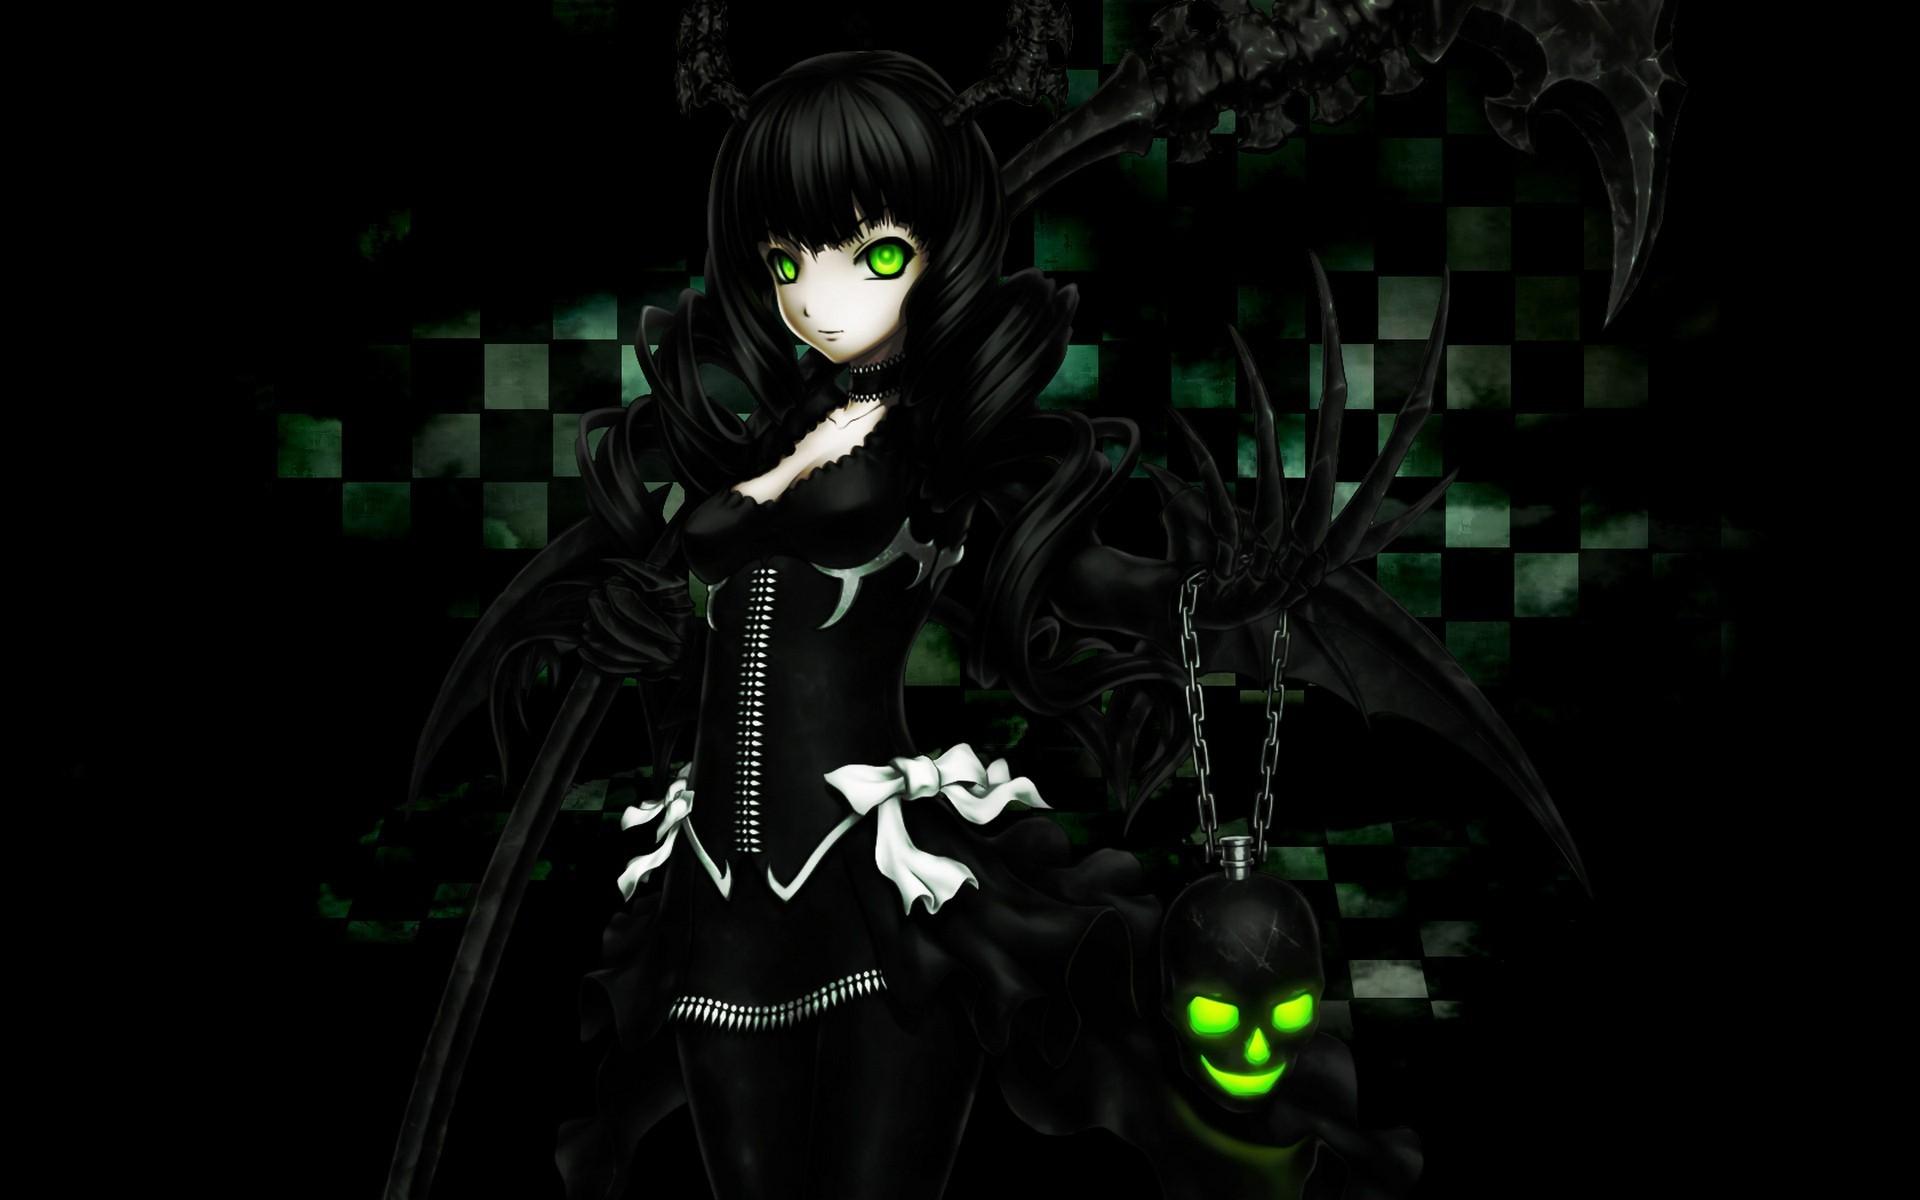 Dark anime girl wallpaper 7871 hd wallpapers jpg x desktop wallpaper 258026